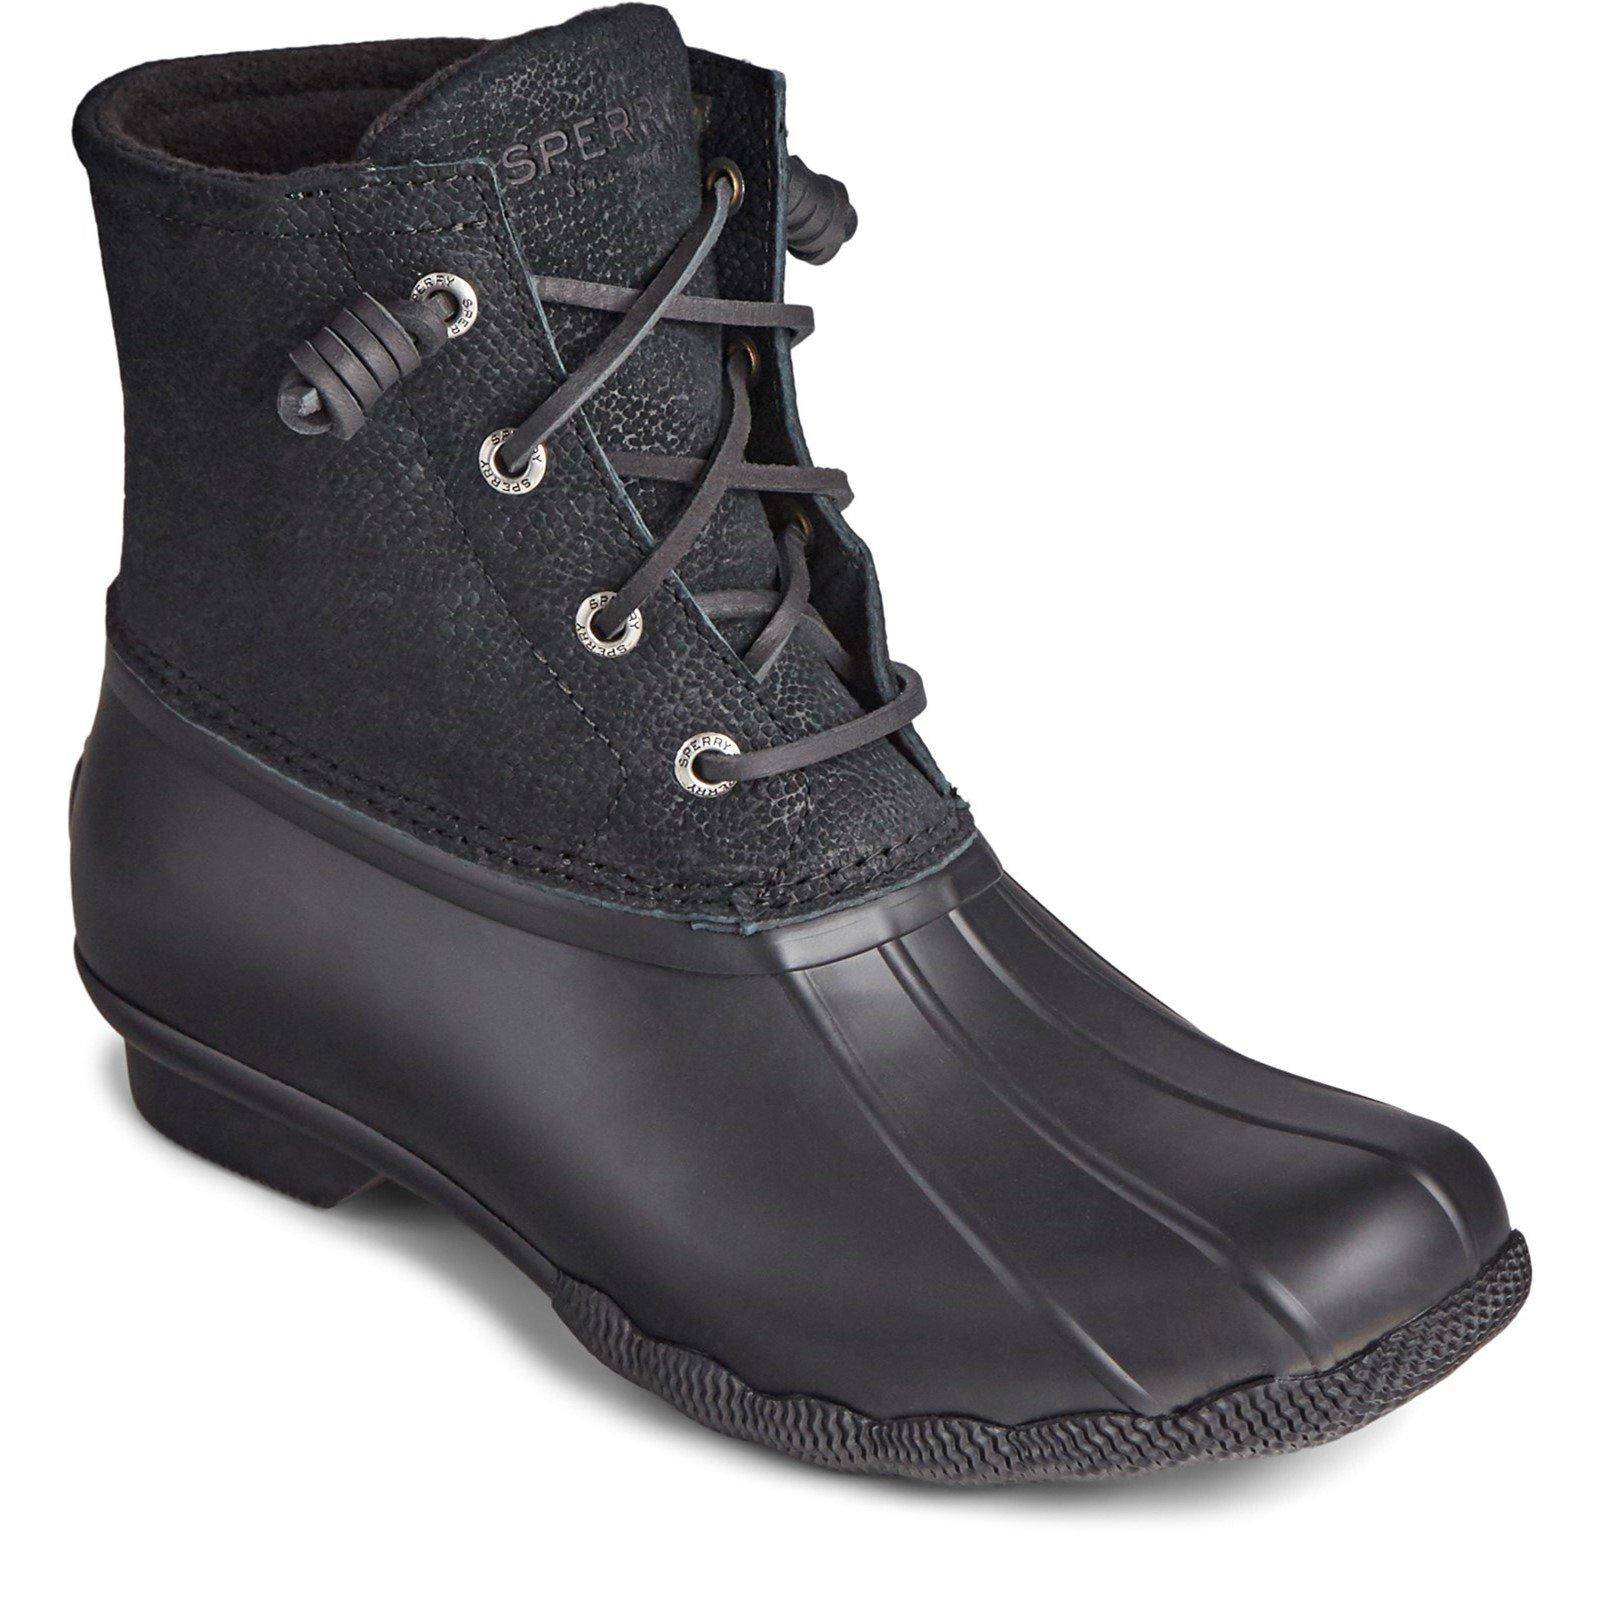 Sperry Women's Saltwater Mid Boot Black 32236 - Black 7